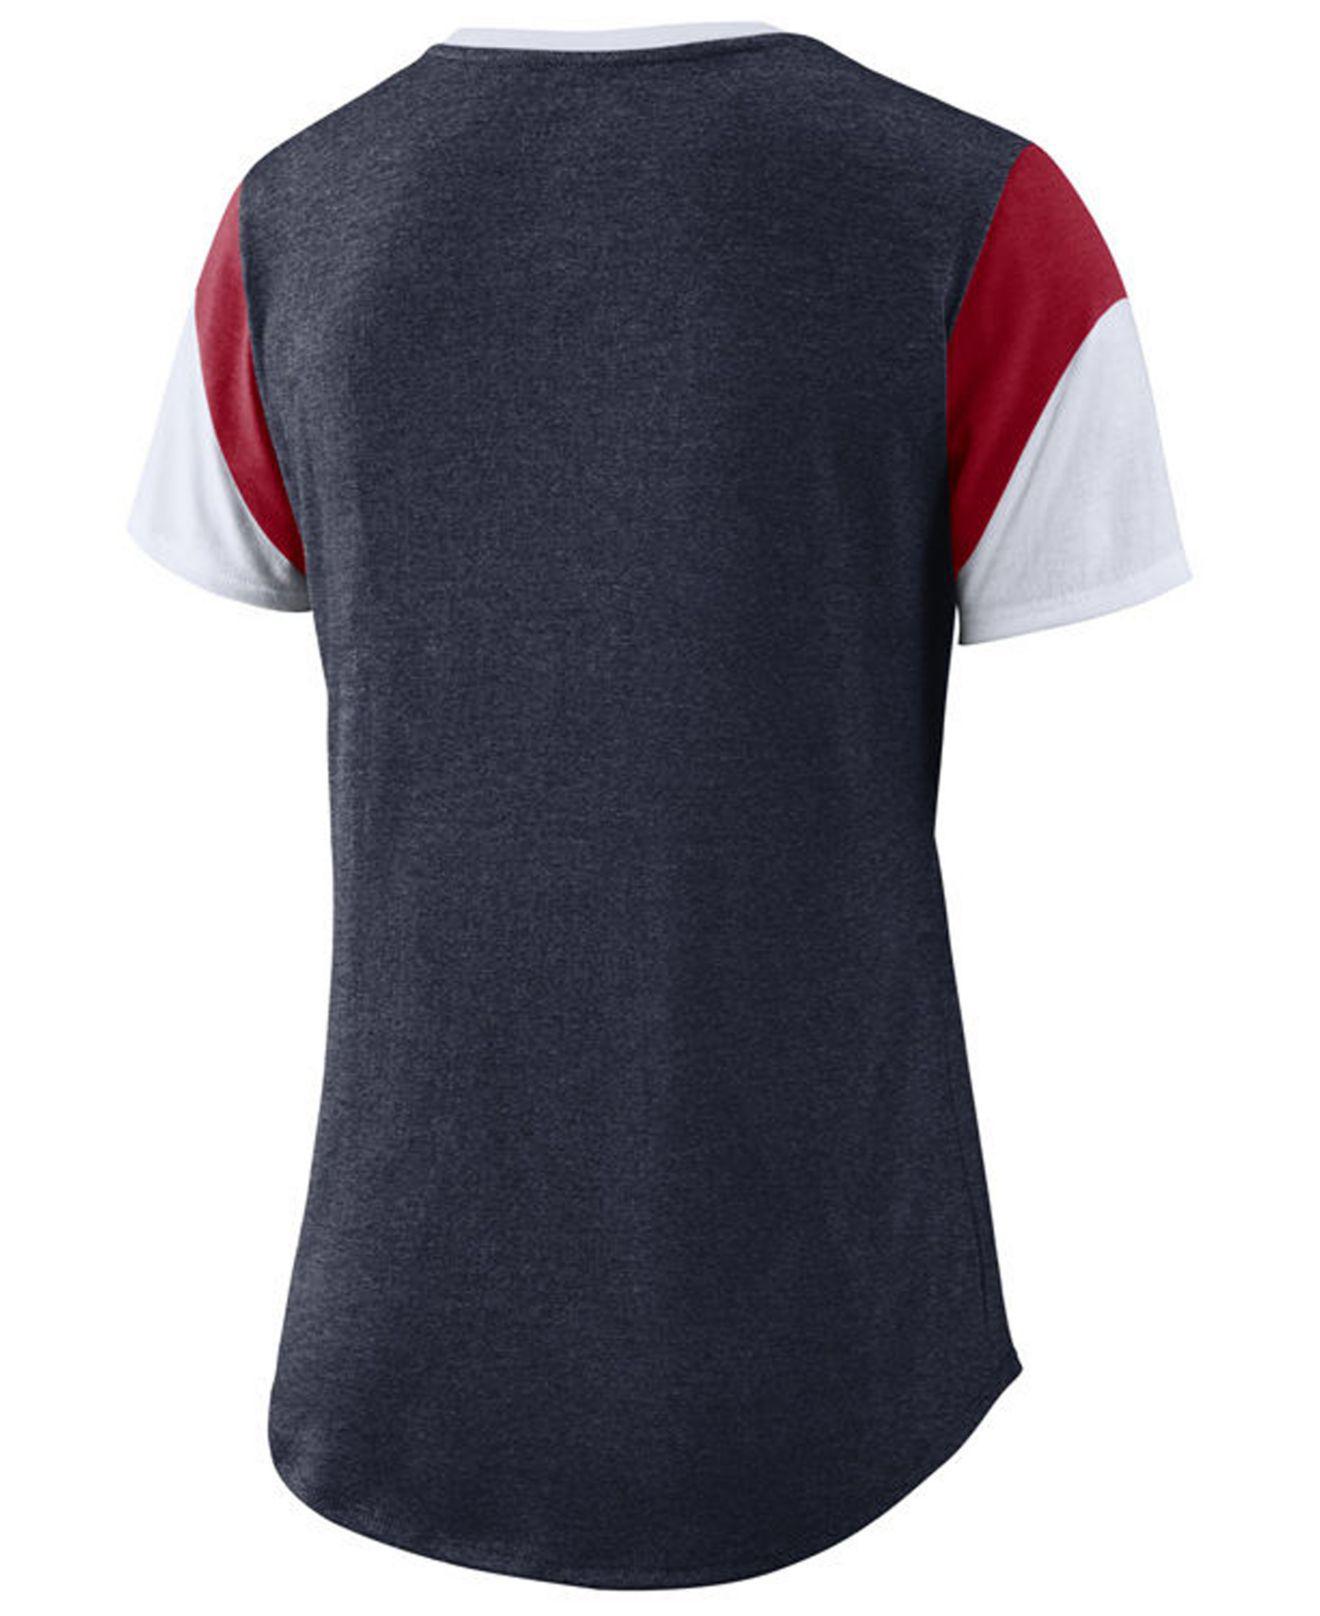 ef630544fba9d Boston Red Sox Womens Dri Fit Cotton T Shirt By Nike – EDGE ...